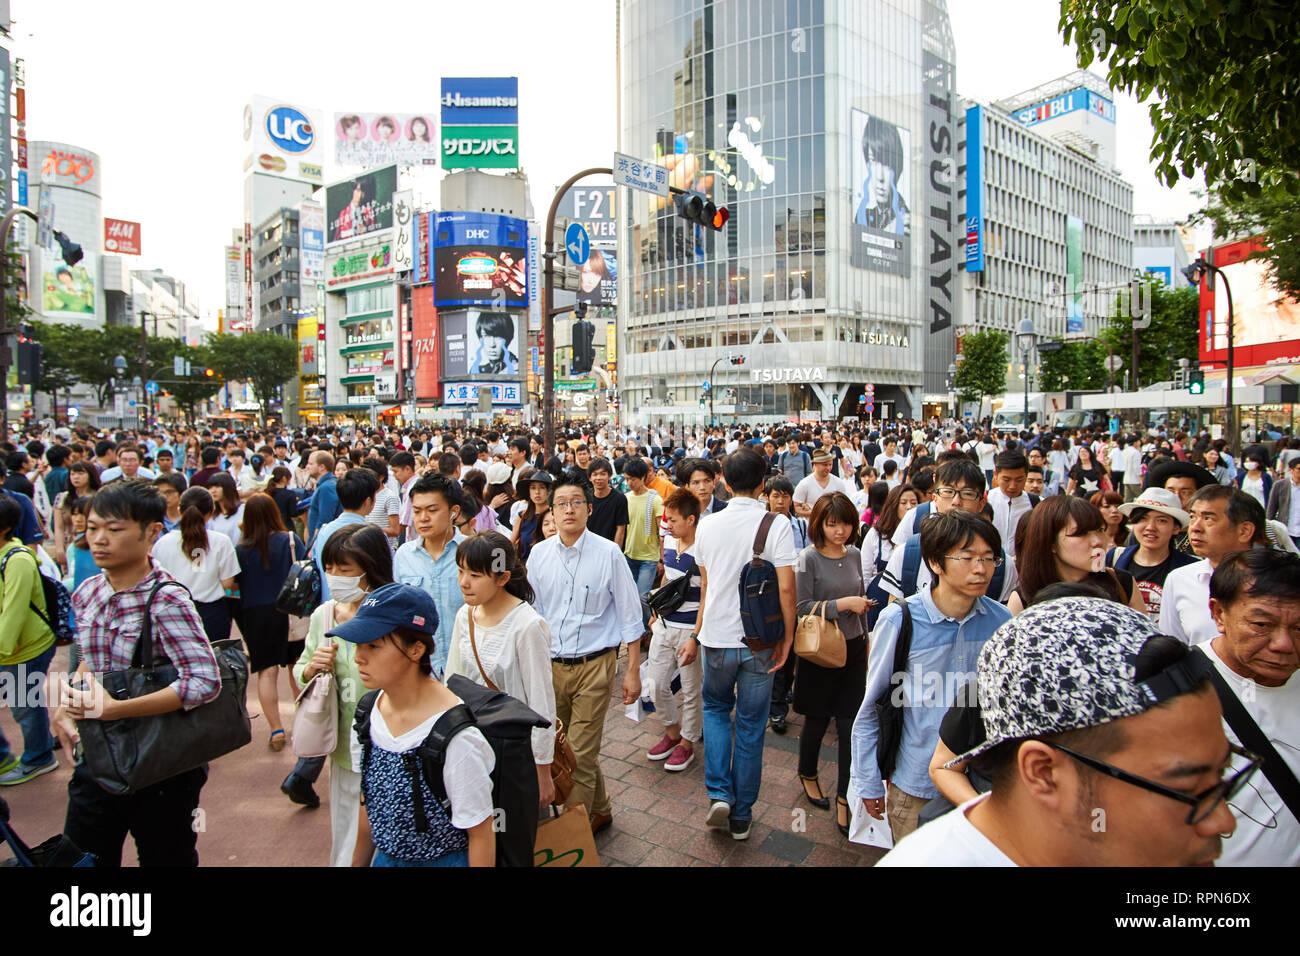 Crowds at Shibuya Crossing in Tokyo, Japan - Stock Image